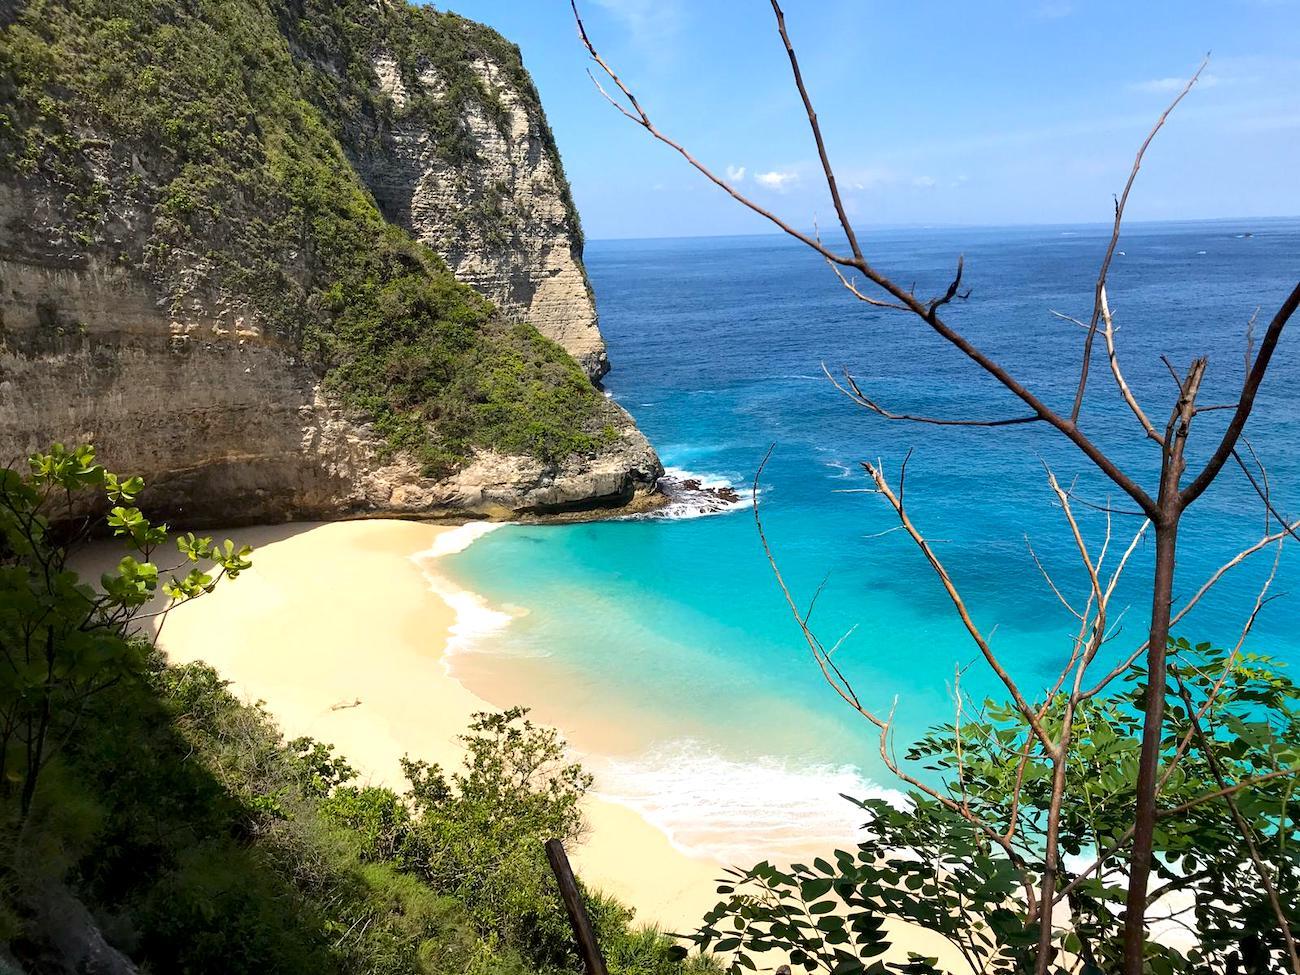 Bali itinerary, Nusa Penida